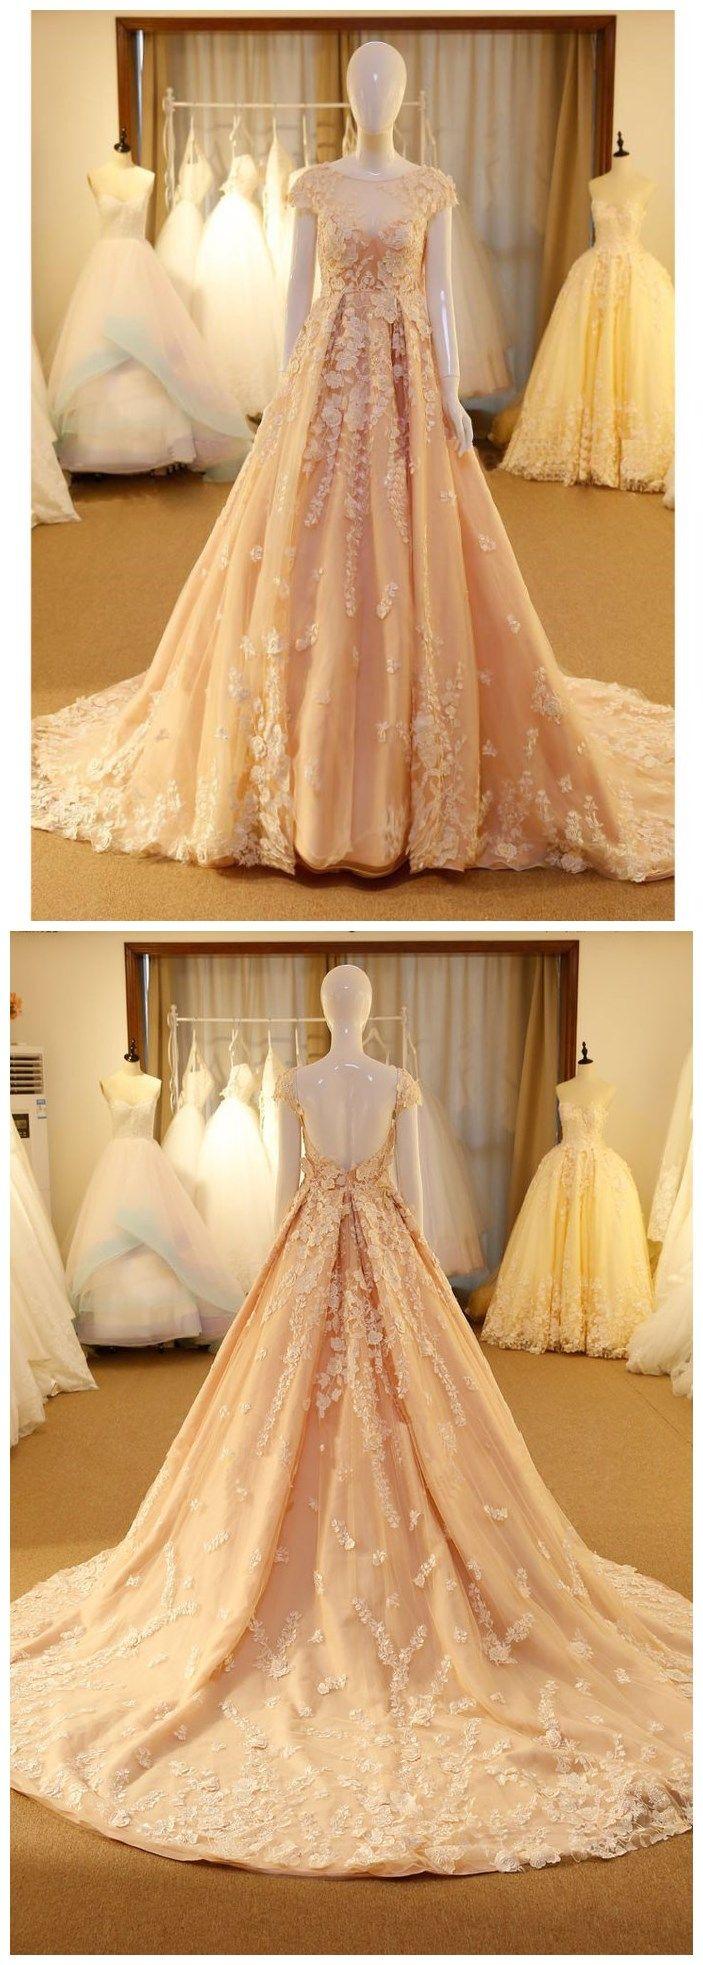 A-line Princess Scoop Neck Cap Sleeveless Chic Prom Dresses, Sweep Train Dresses ASD26798 #scoopneck #princess #promdress #party #girl #sweeptrain #sleeveless #fashion #appliques #autumn #fall